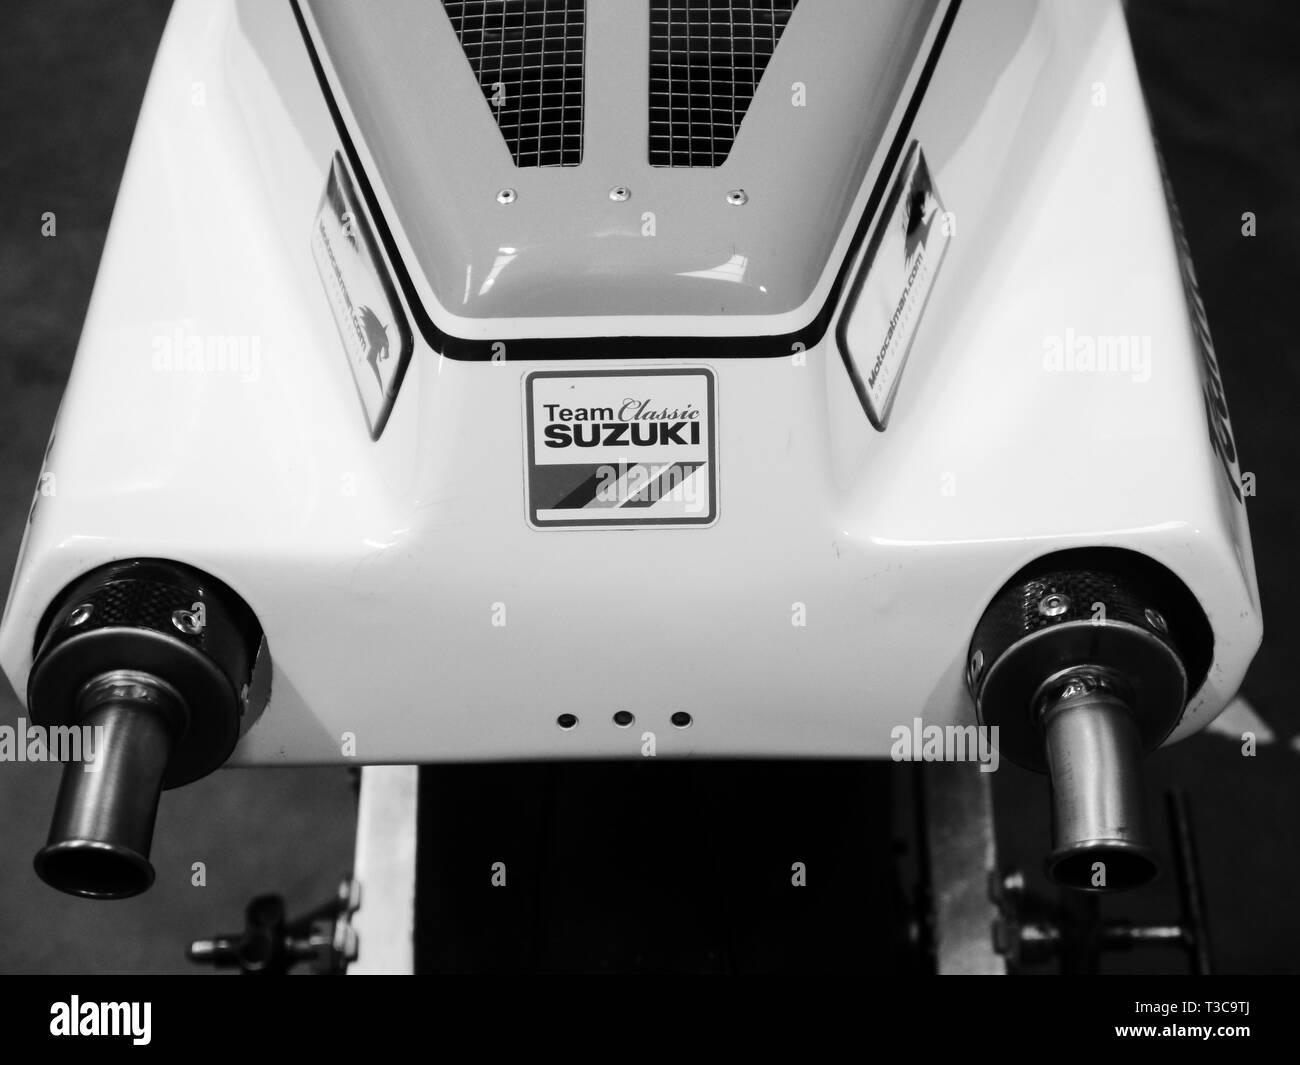 Team Classic Suzuki RG500 as ridden by Danny Webb - Stock Image